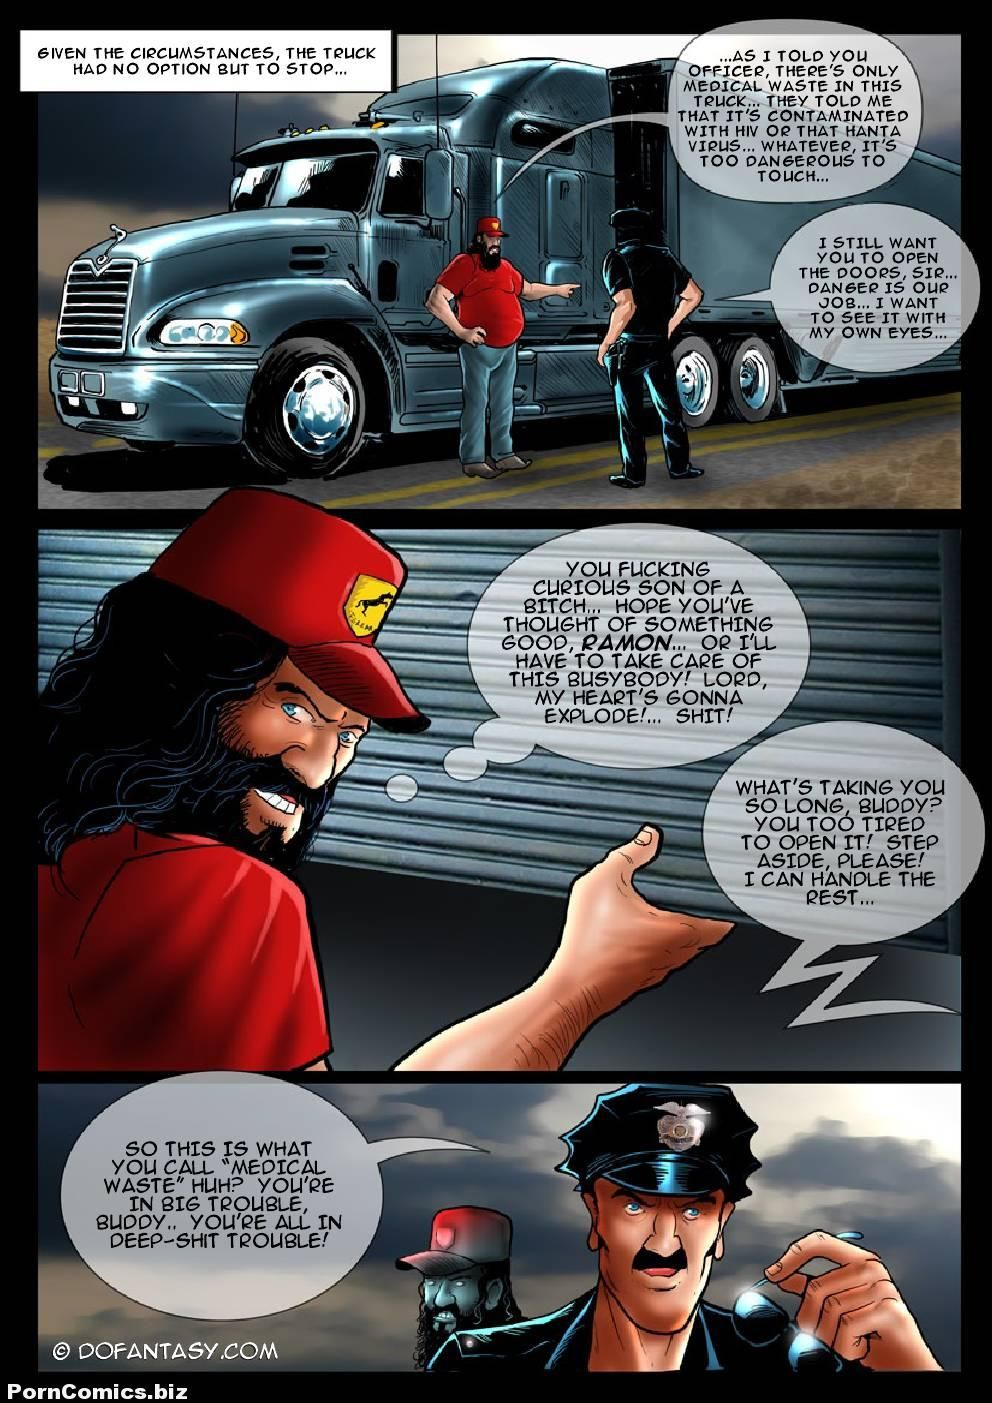 dofantasy - bsdmCAGRI-Mad Truck,BDSM Page 21 - Free Porn